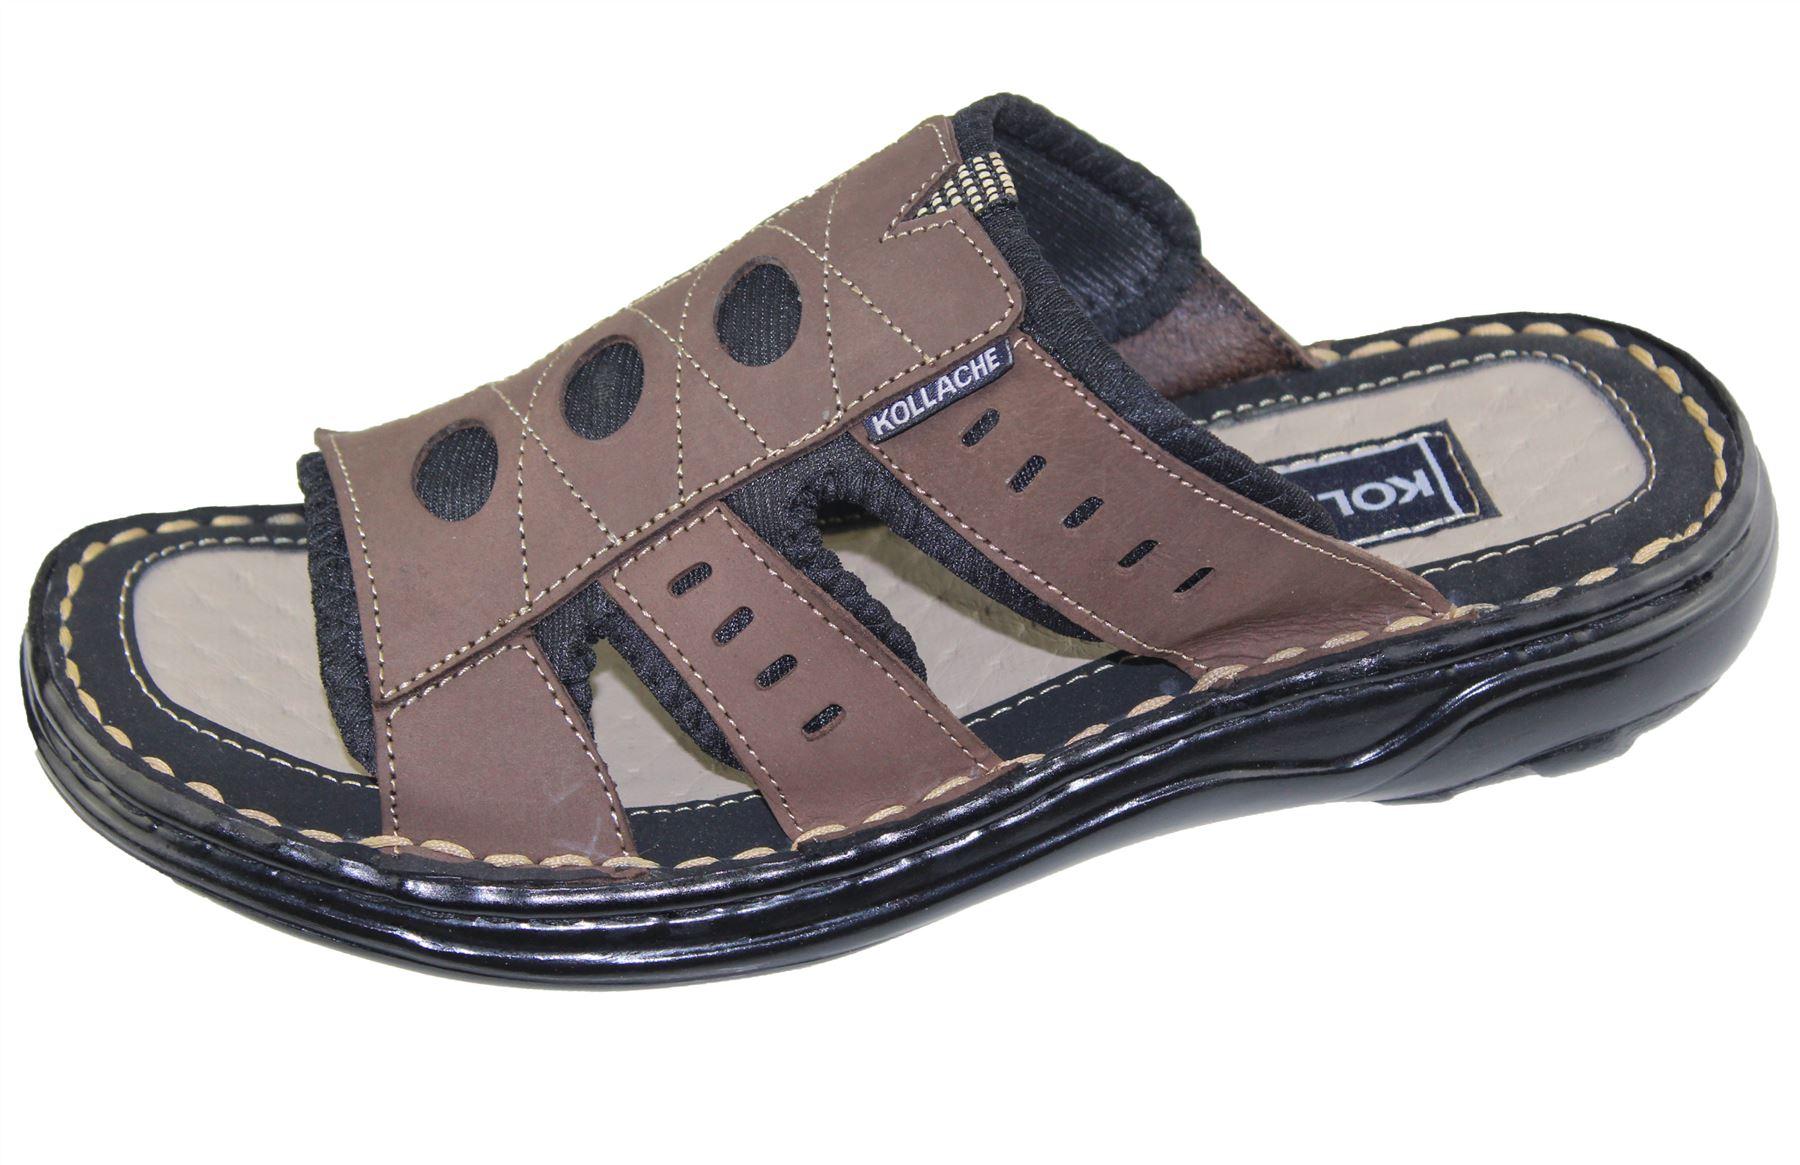 Mens-Slipper-Sandal-Sports-Beach-Buckle-Walking-Fashion-Summer-Casual-Shoes-Size miniatura 20